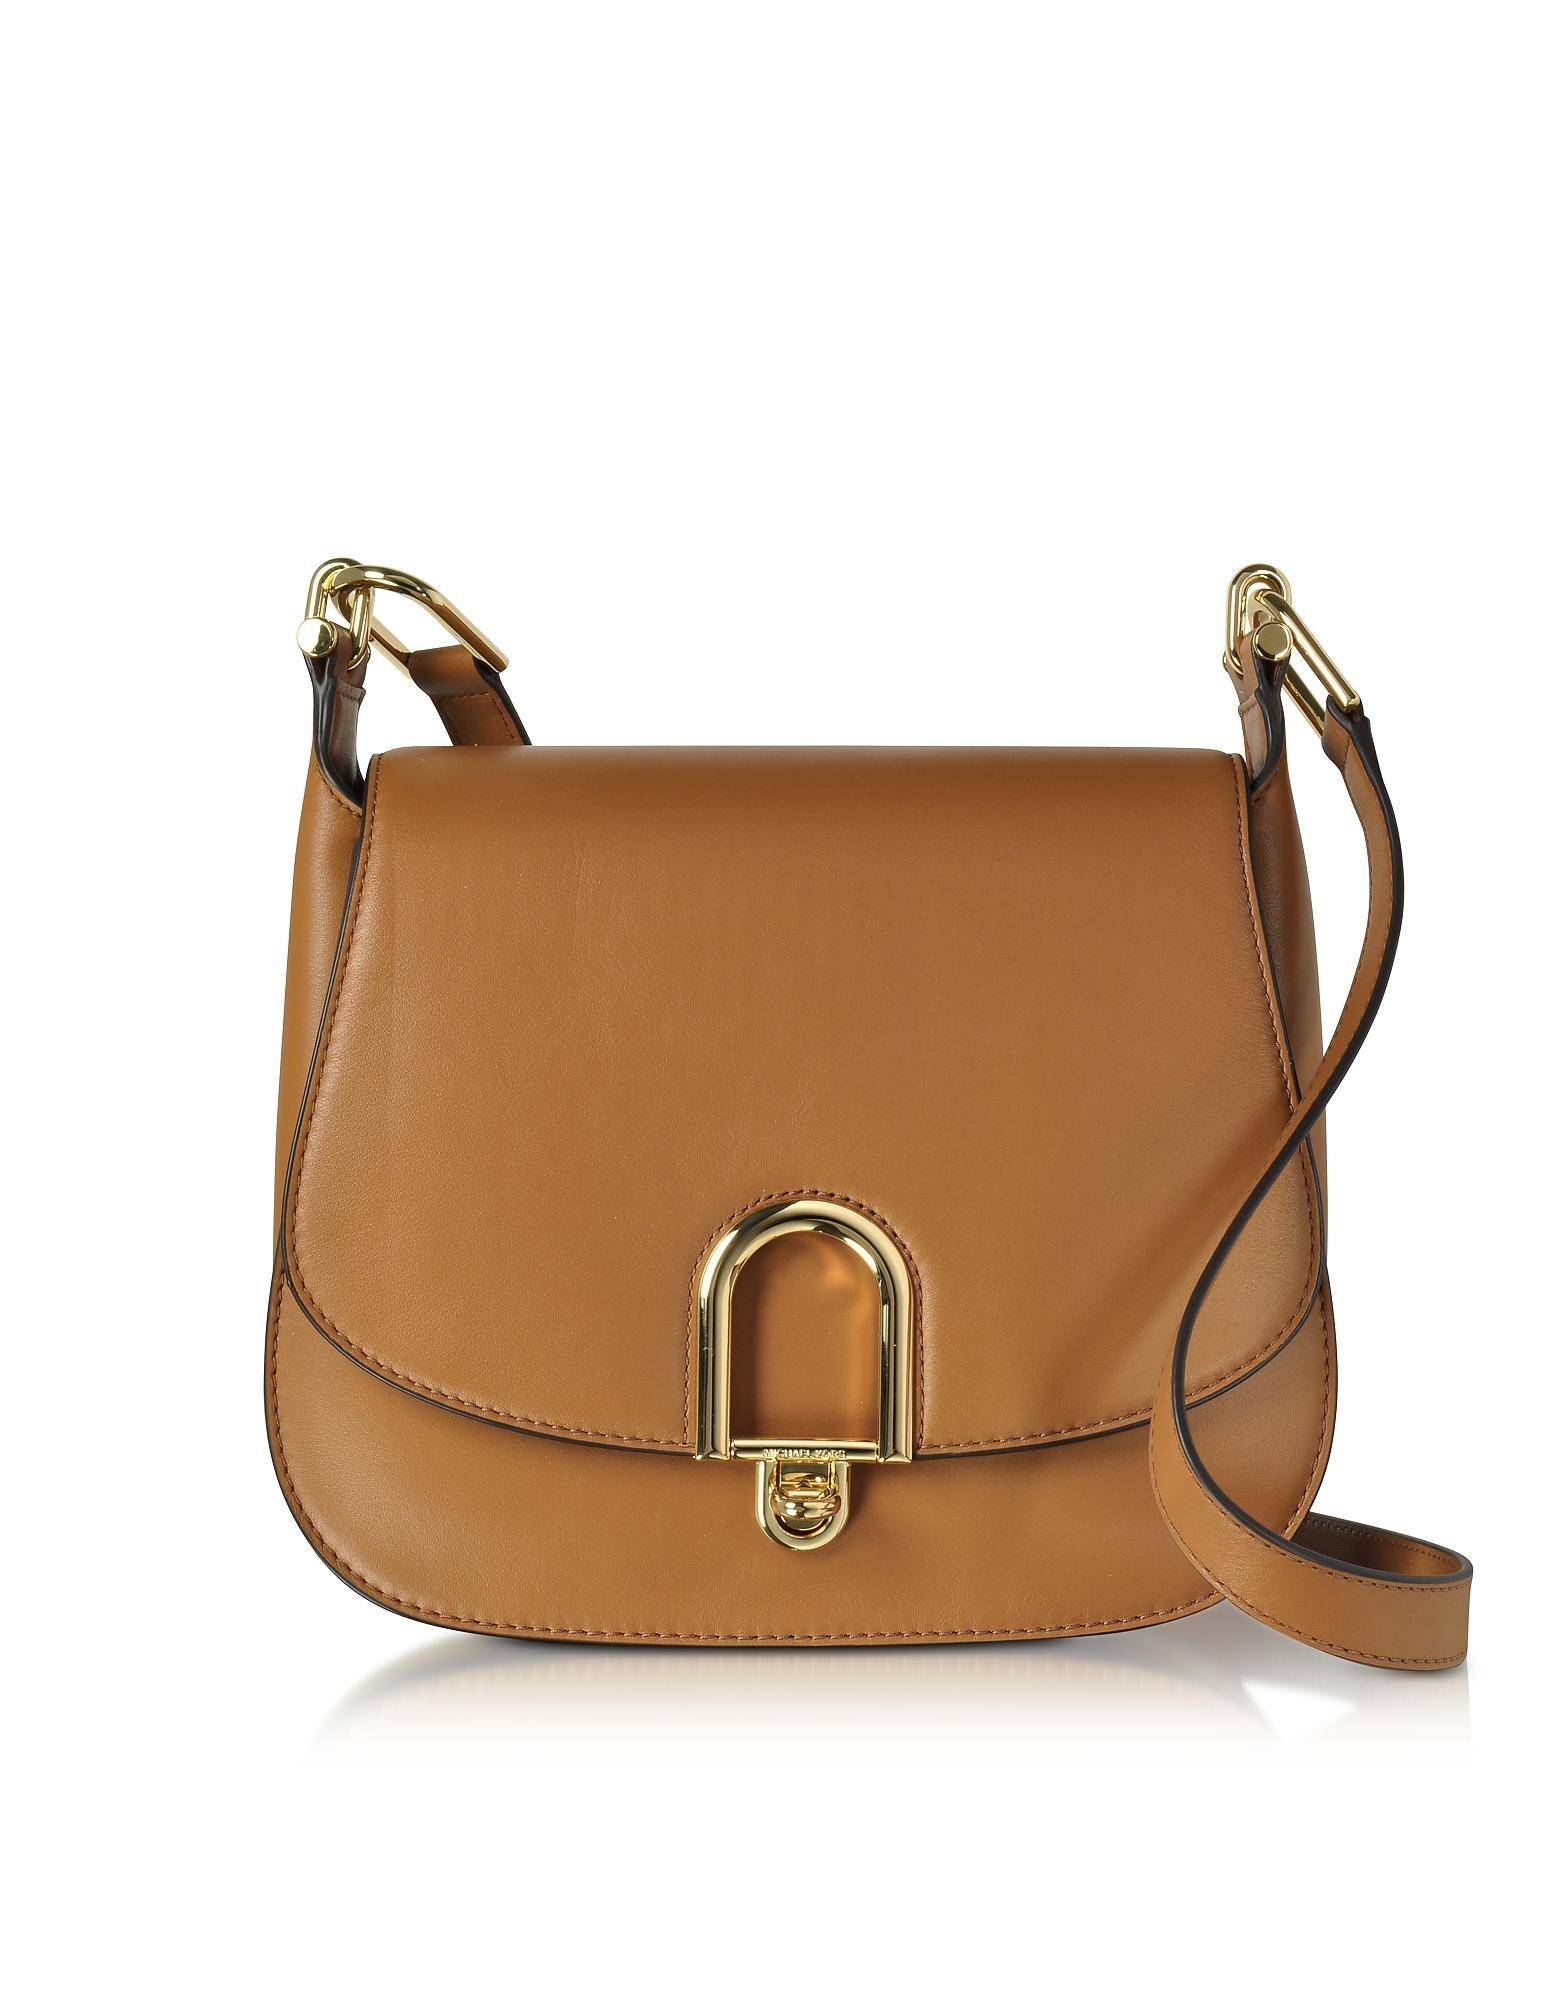 d4a7e42129 Michael Kors Delfina Large Acorn Leather Saddle Bag in Brown - Lyst